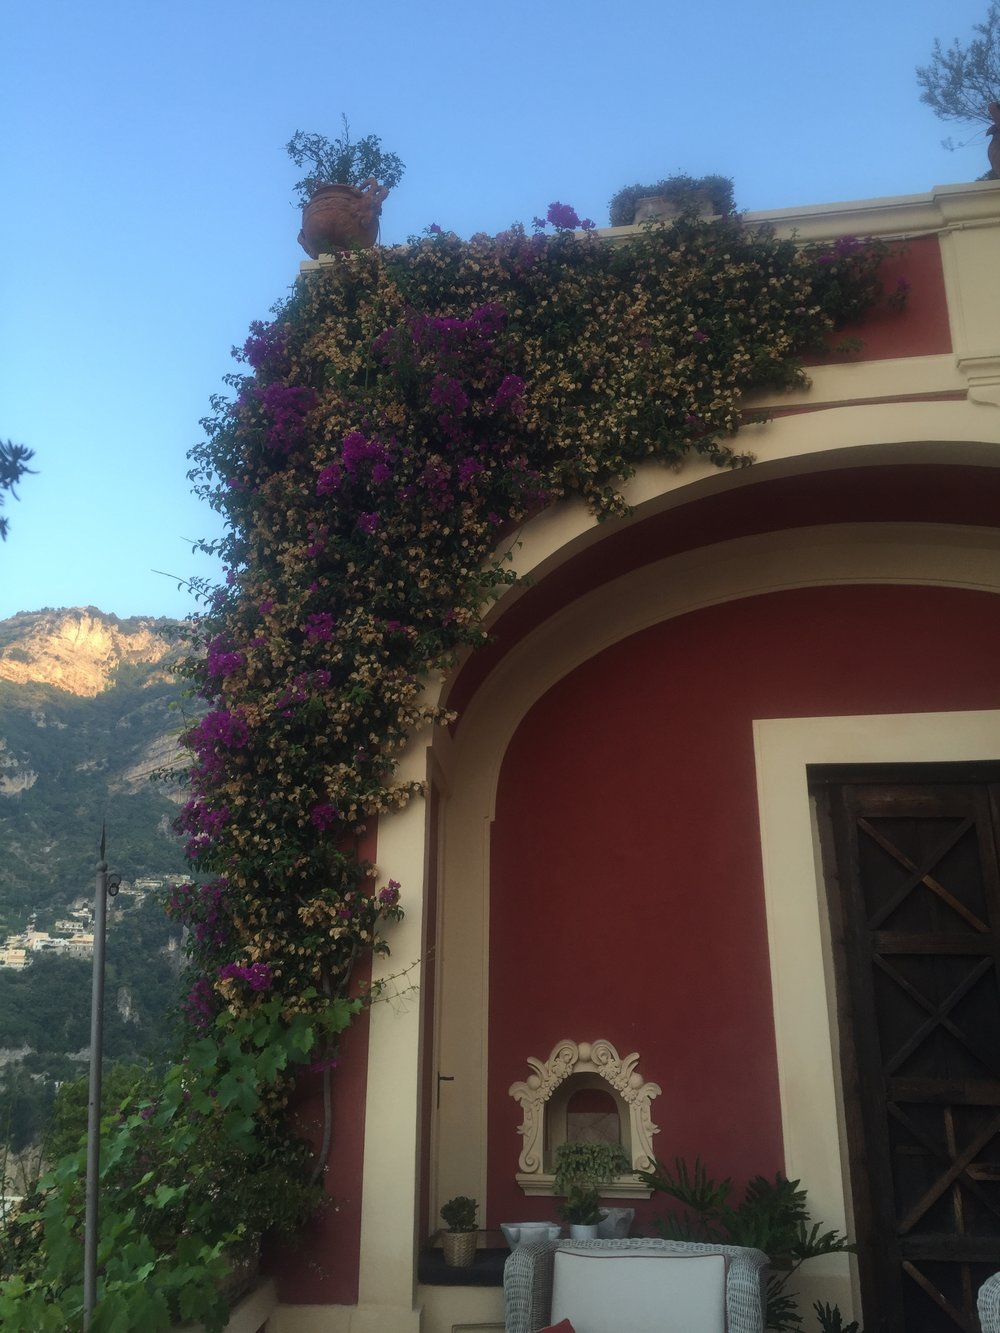 VillaDorata.Positano.Italy.LuxuryRetreats.GoingGosnell.JPG